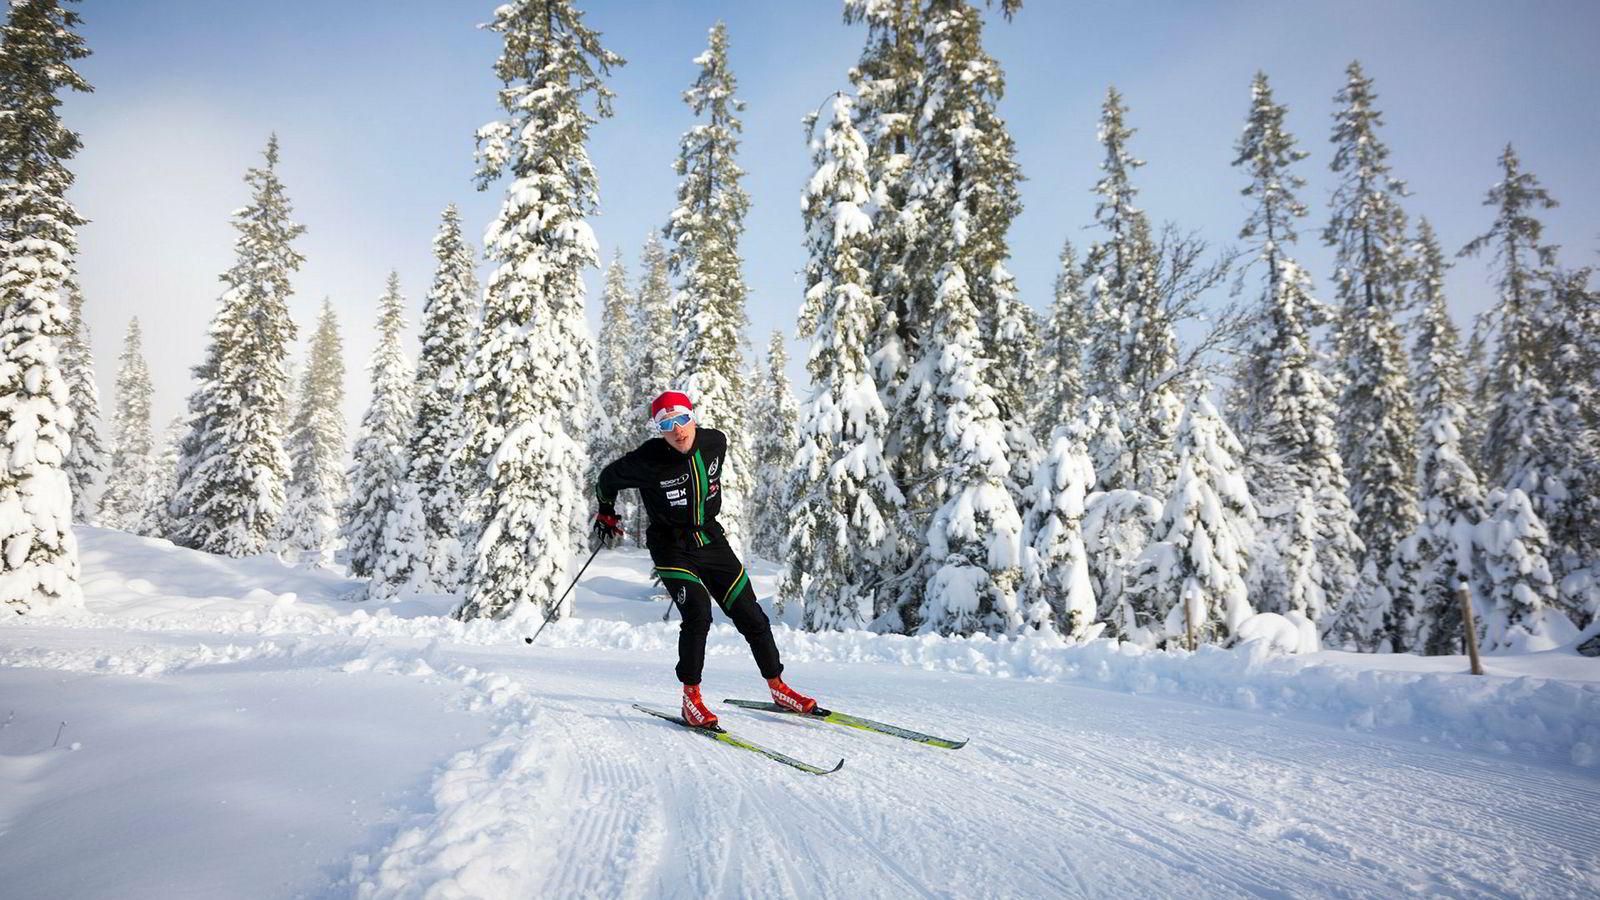 Andreas Staune-Mittet kunne utnytte perfekte forhold på Natrudstilen nedenfor Sjusjøen onsdag formiddag. Det ligger anslagsvis 30 centimeter natursnø i skogene her etter snøfallet som kom fra tirsdag til onsdag.